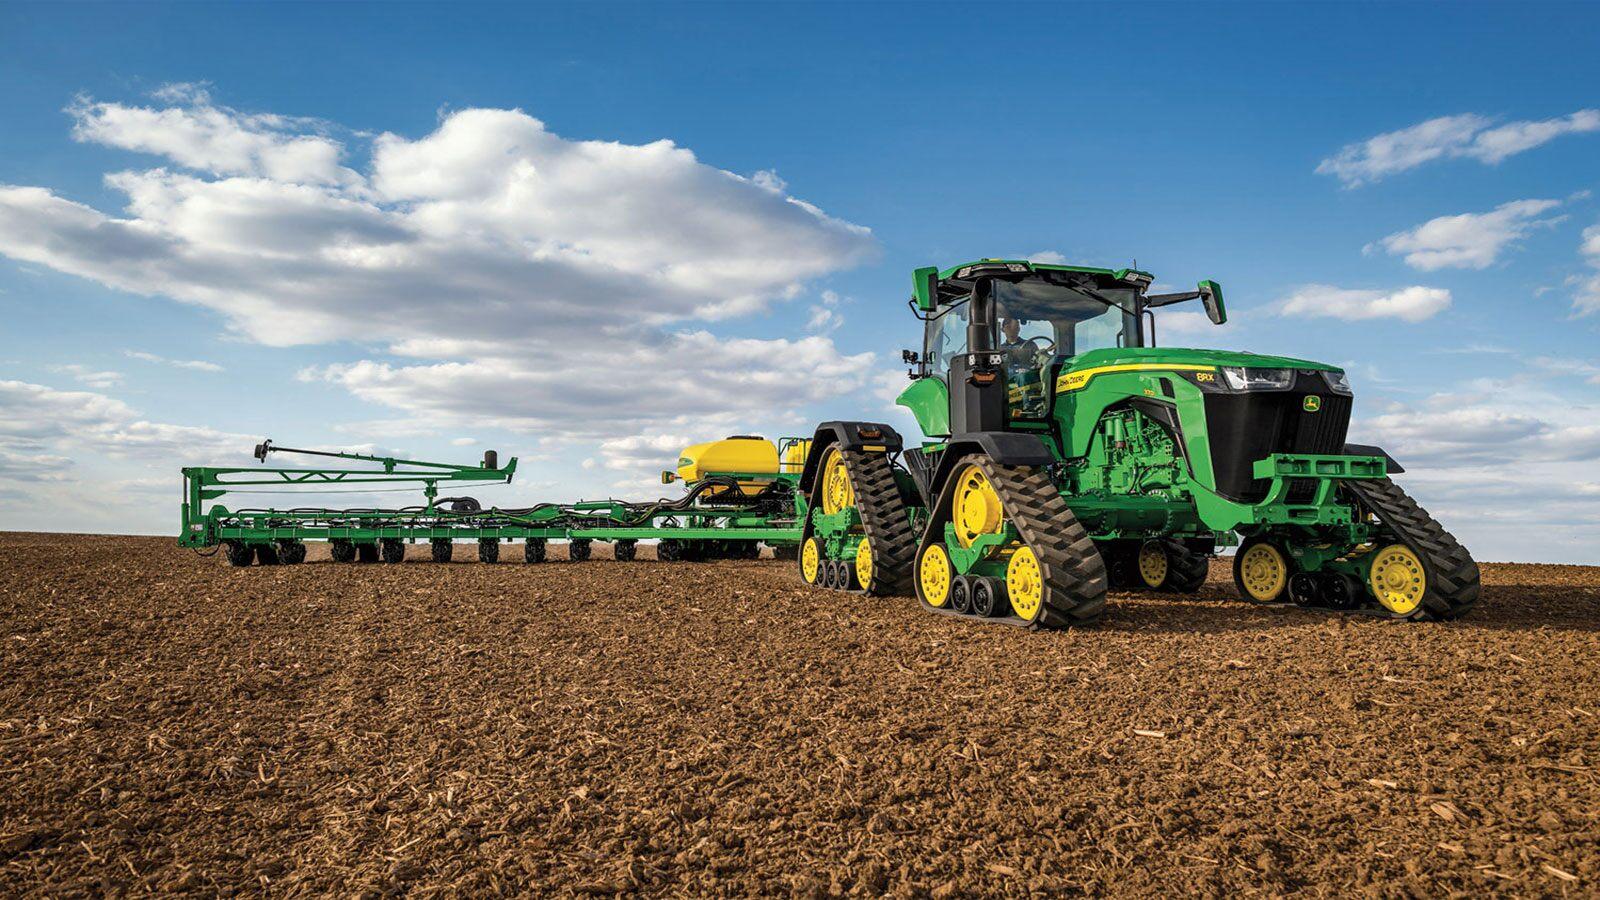 8rx-370-tractor-1600x900-imagegalleryjpg